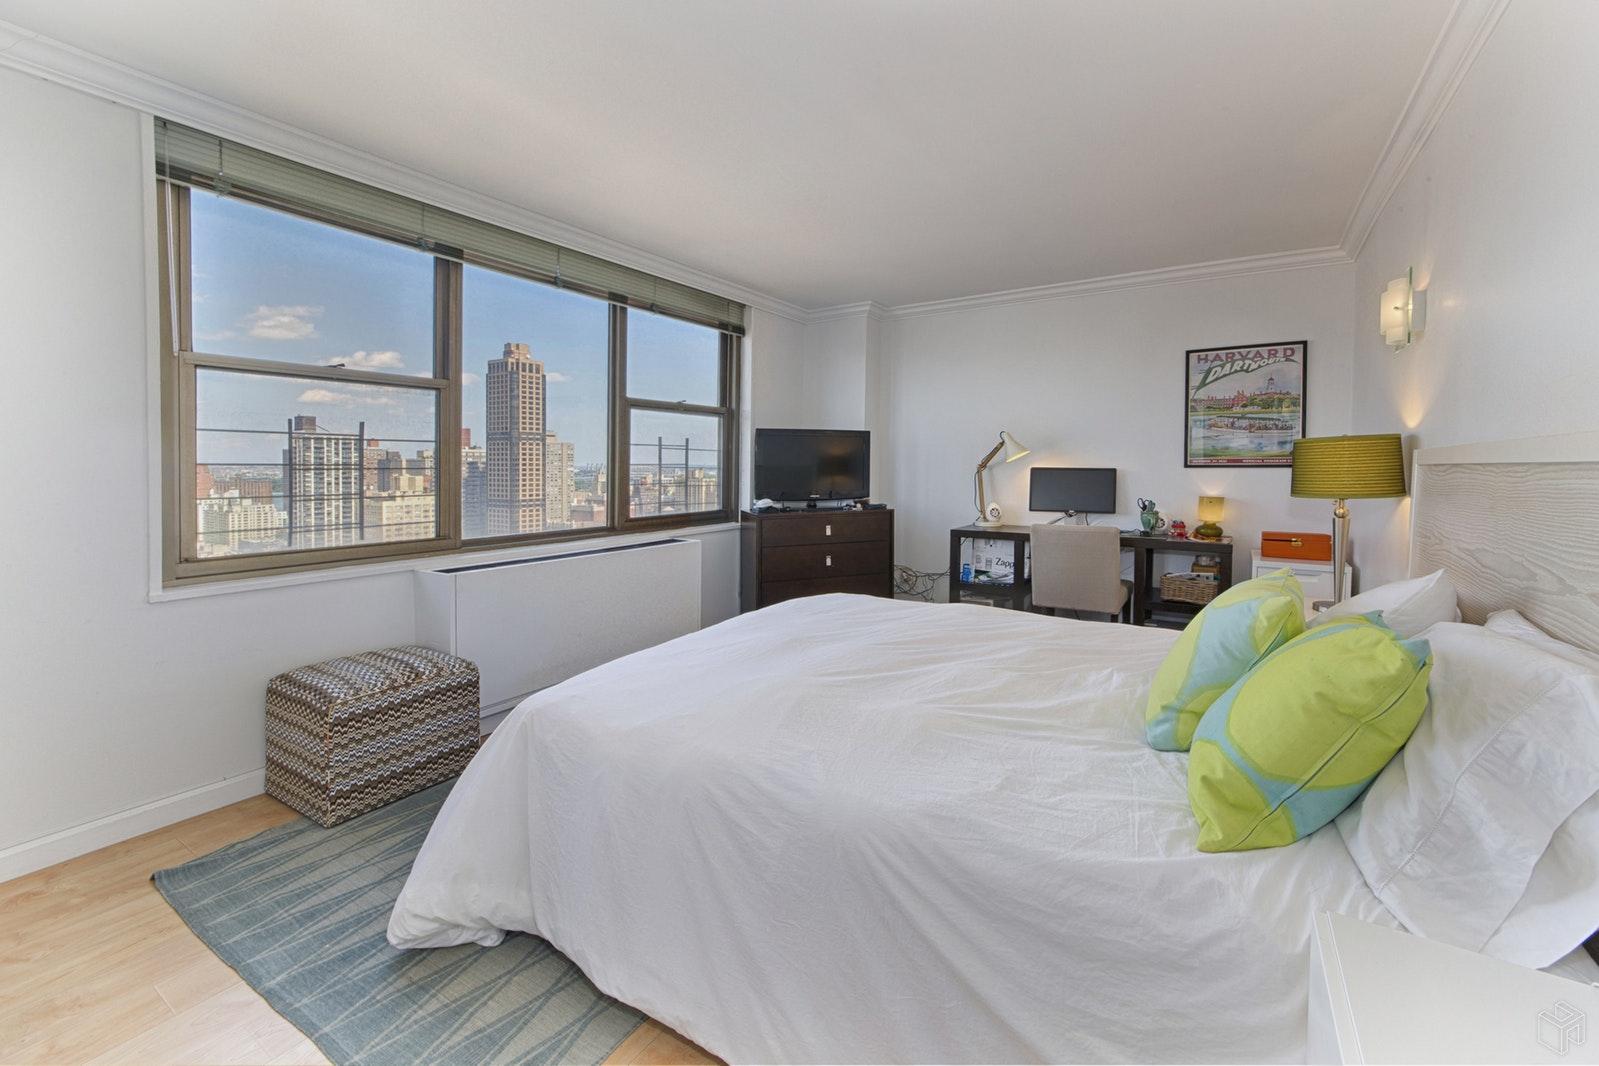 301 EAST 79TH STREET 31/E, Upper East Side, $839,000, Web #: 19525959